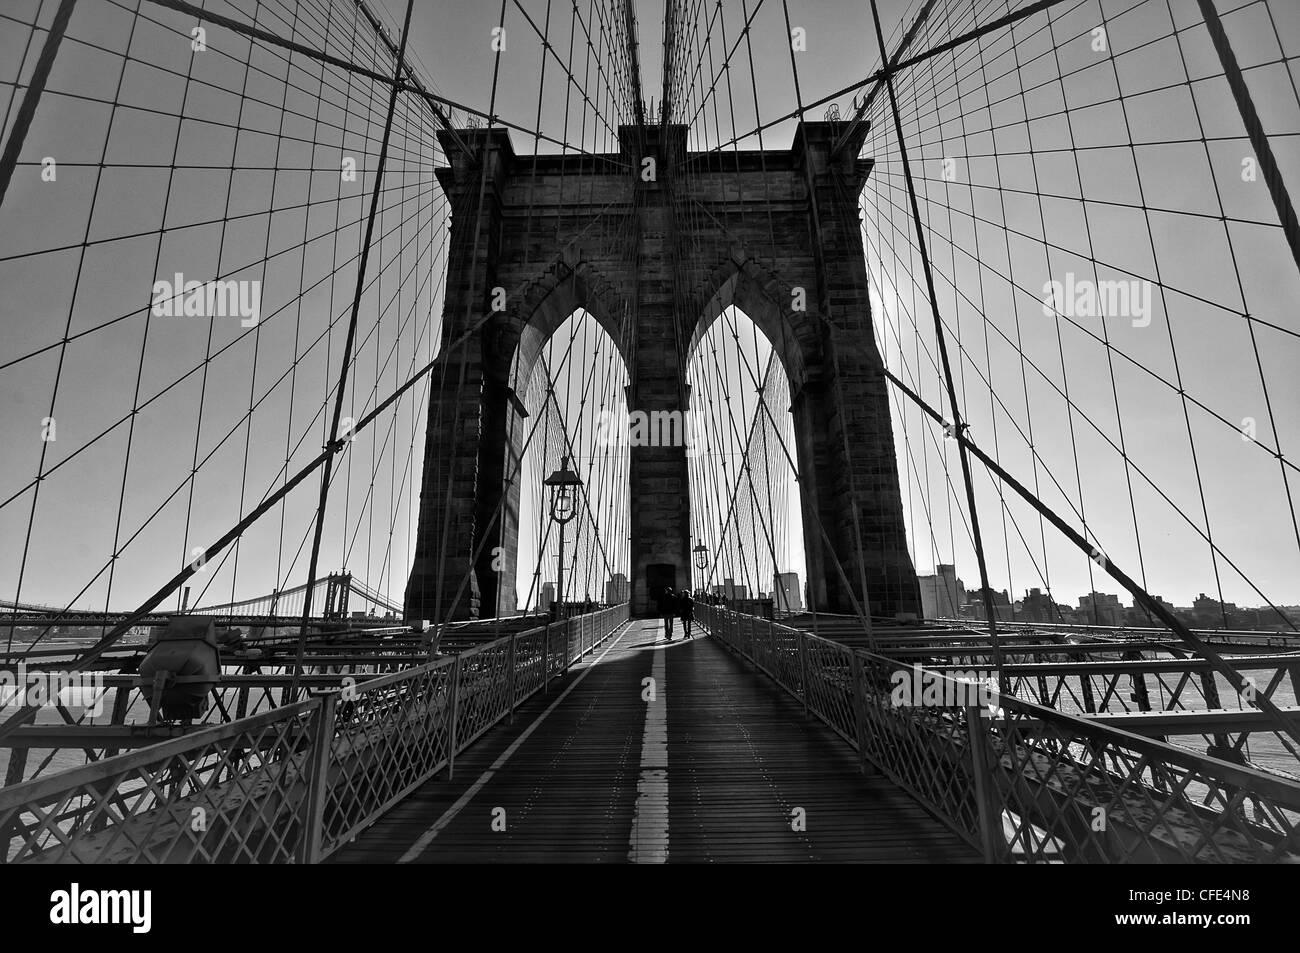 Black and white of the world famous Brooklyn Bridge walkway - Stock Image